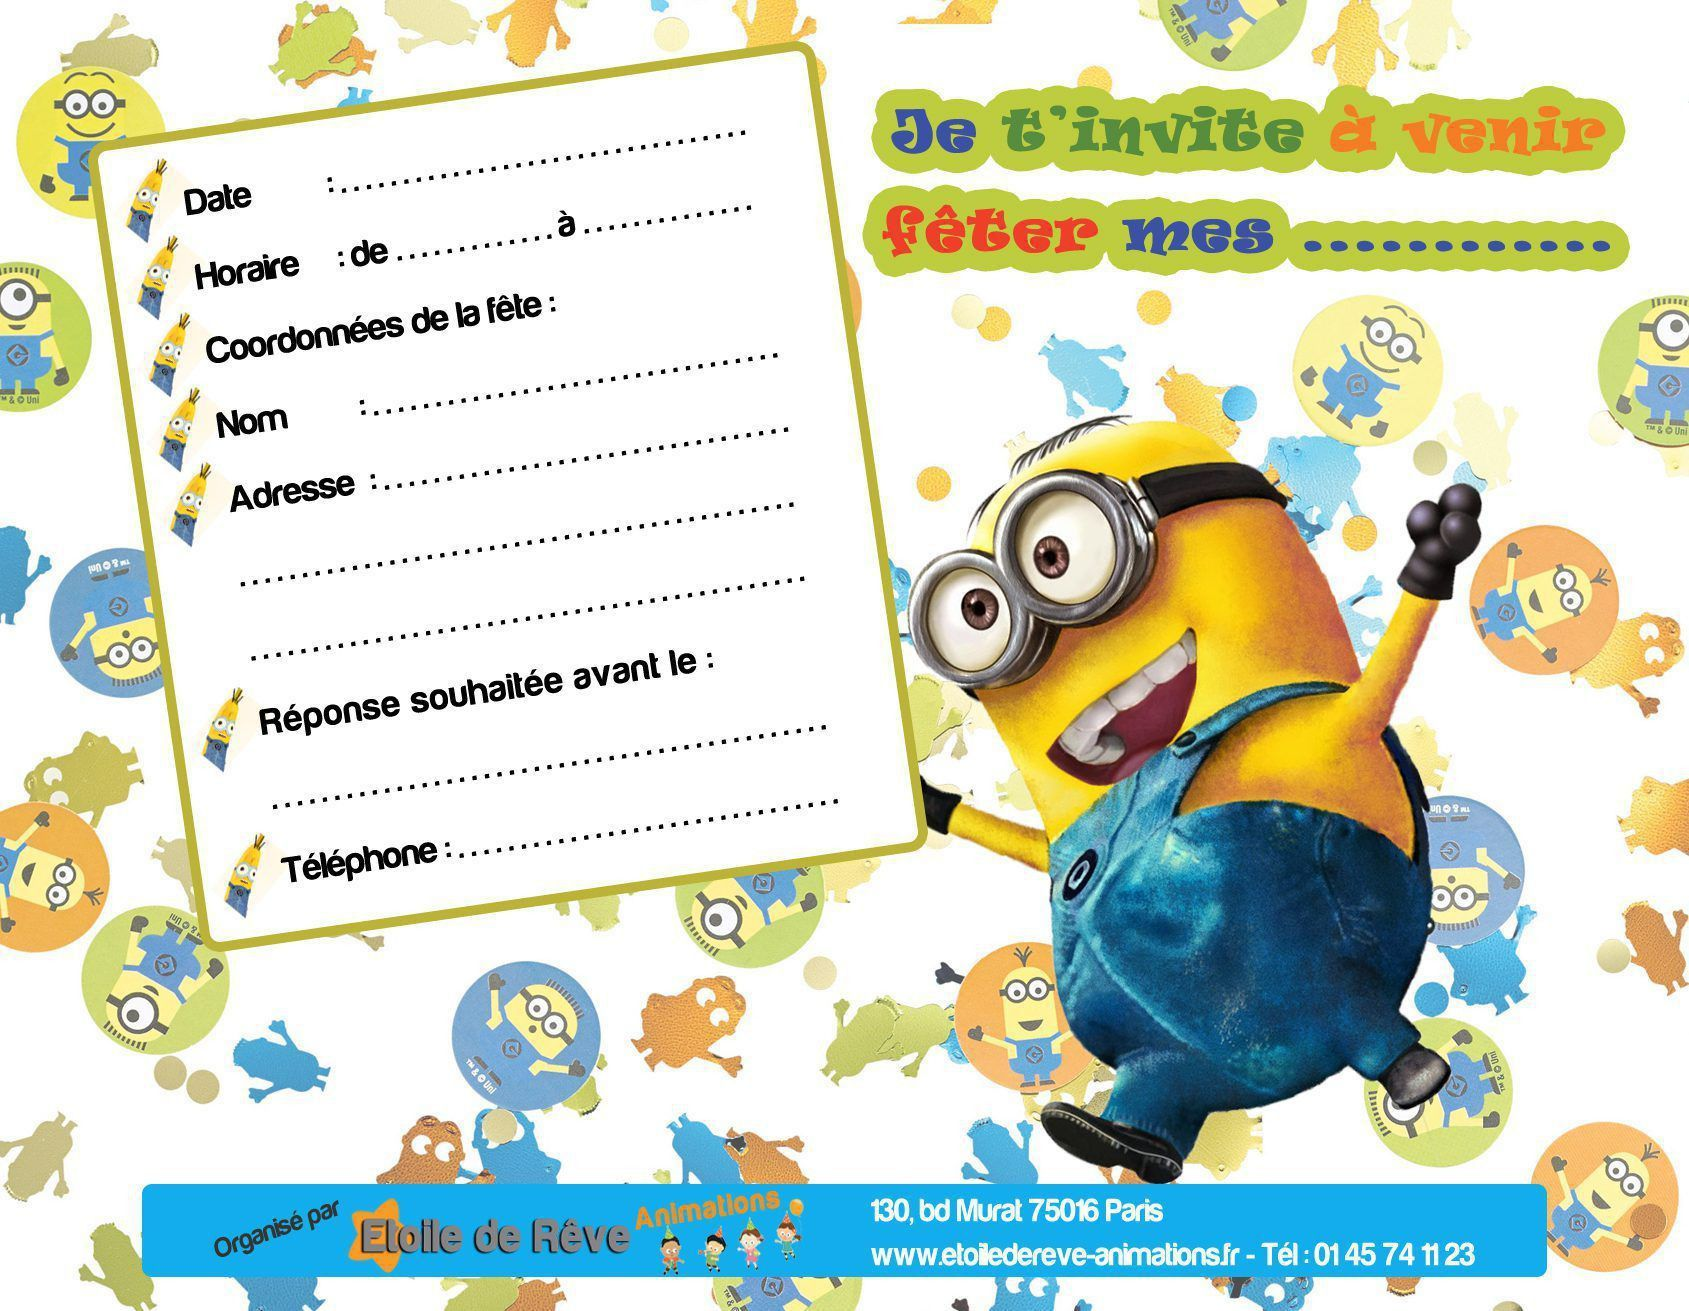 Carte D Invitation Anniversaire Gratuite Imprimer Inspirational